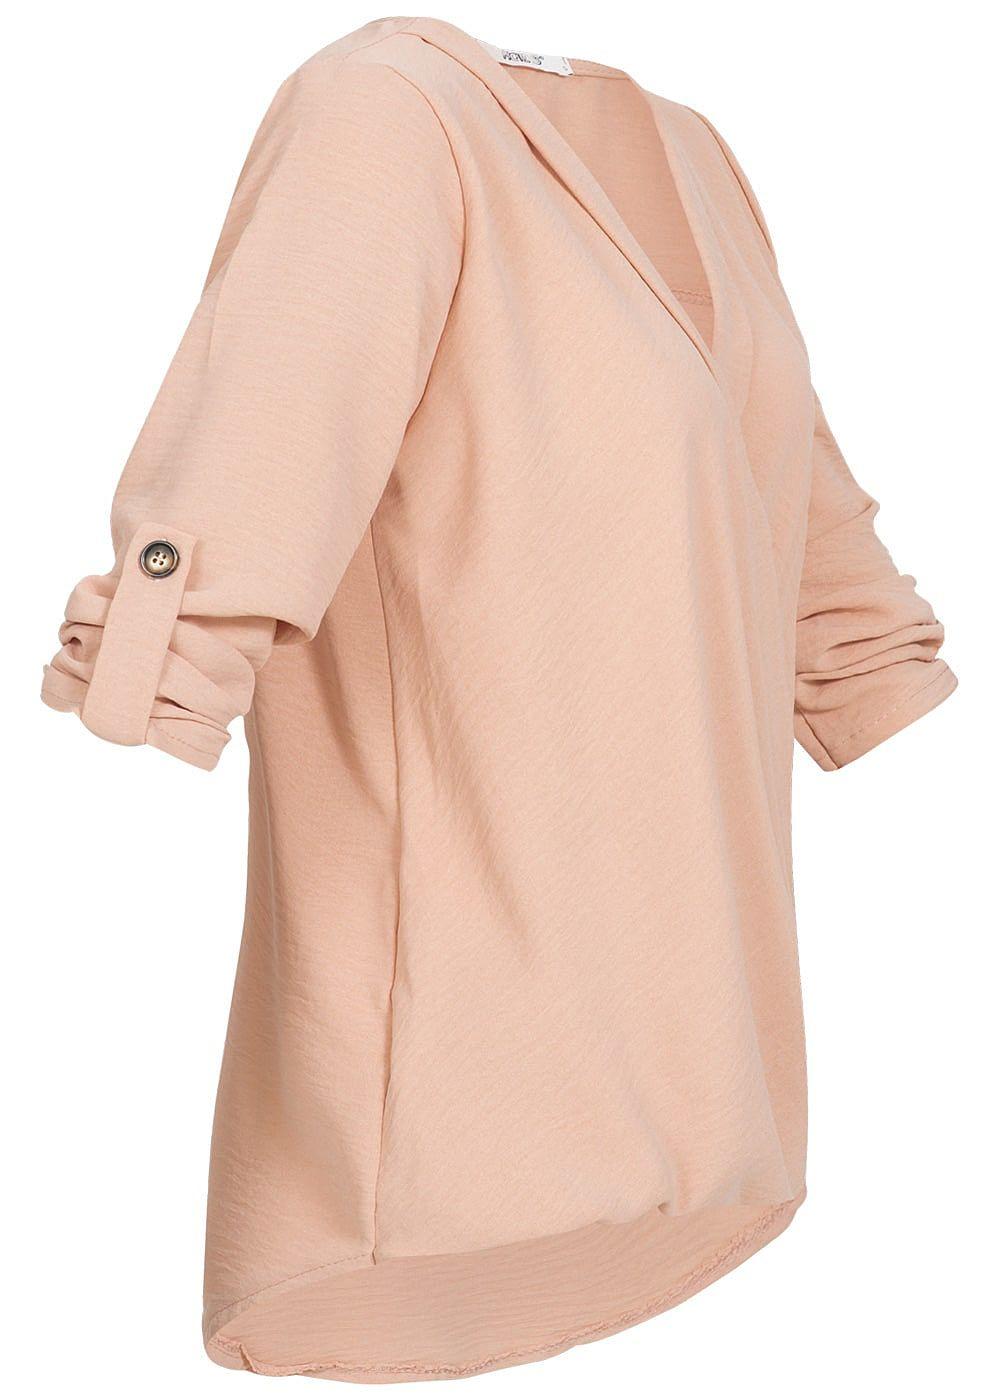 7bcc596cdd7e69 Hailys Damen 3 4 Arm Shirt Knotendetail vorne dunkel rosa - 77onlineshop